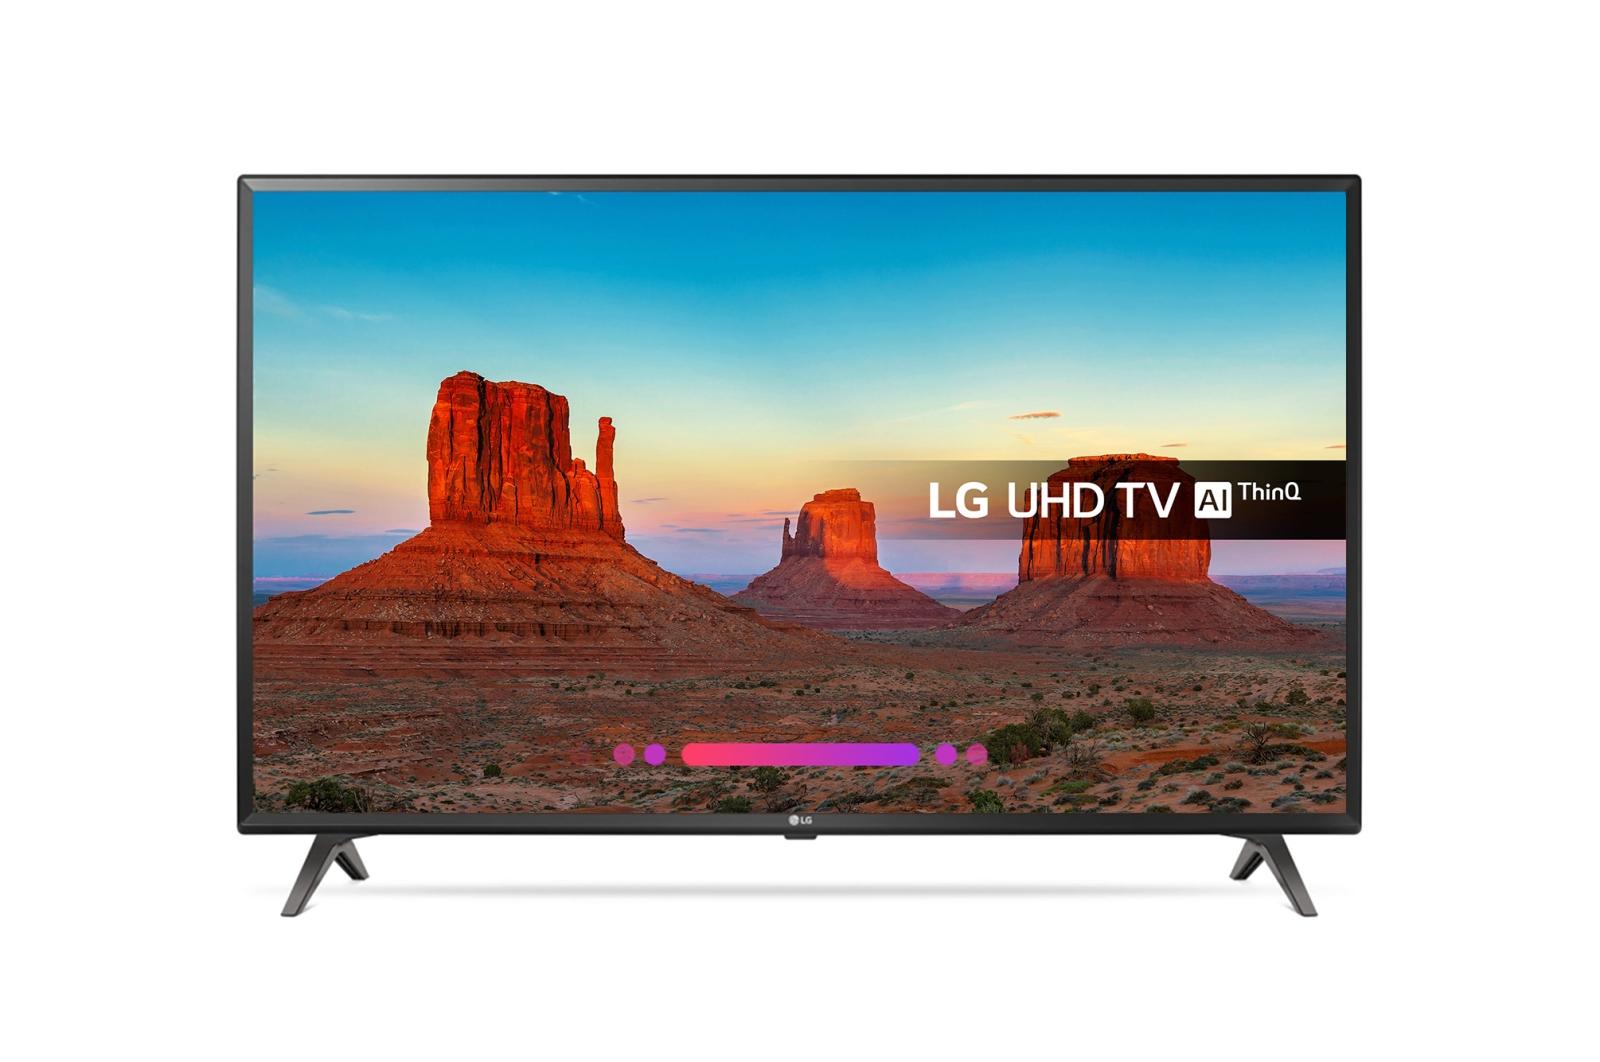 LG 49UK6300PLB 4K Ultra HD HDR Freeview Freesat HD Smart LED TV 49